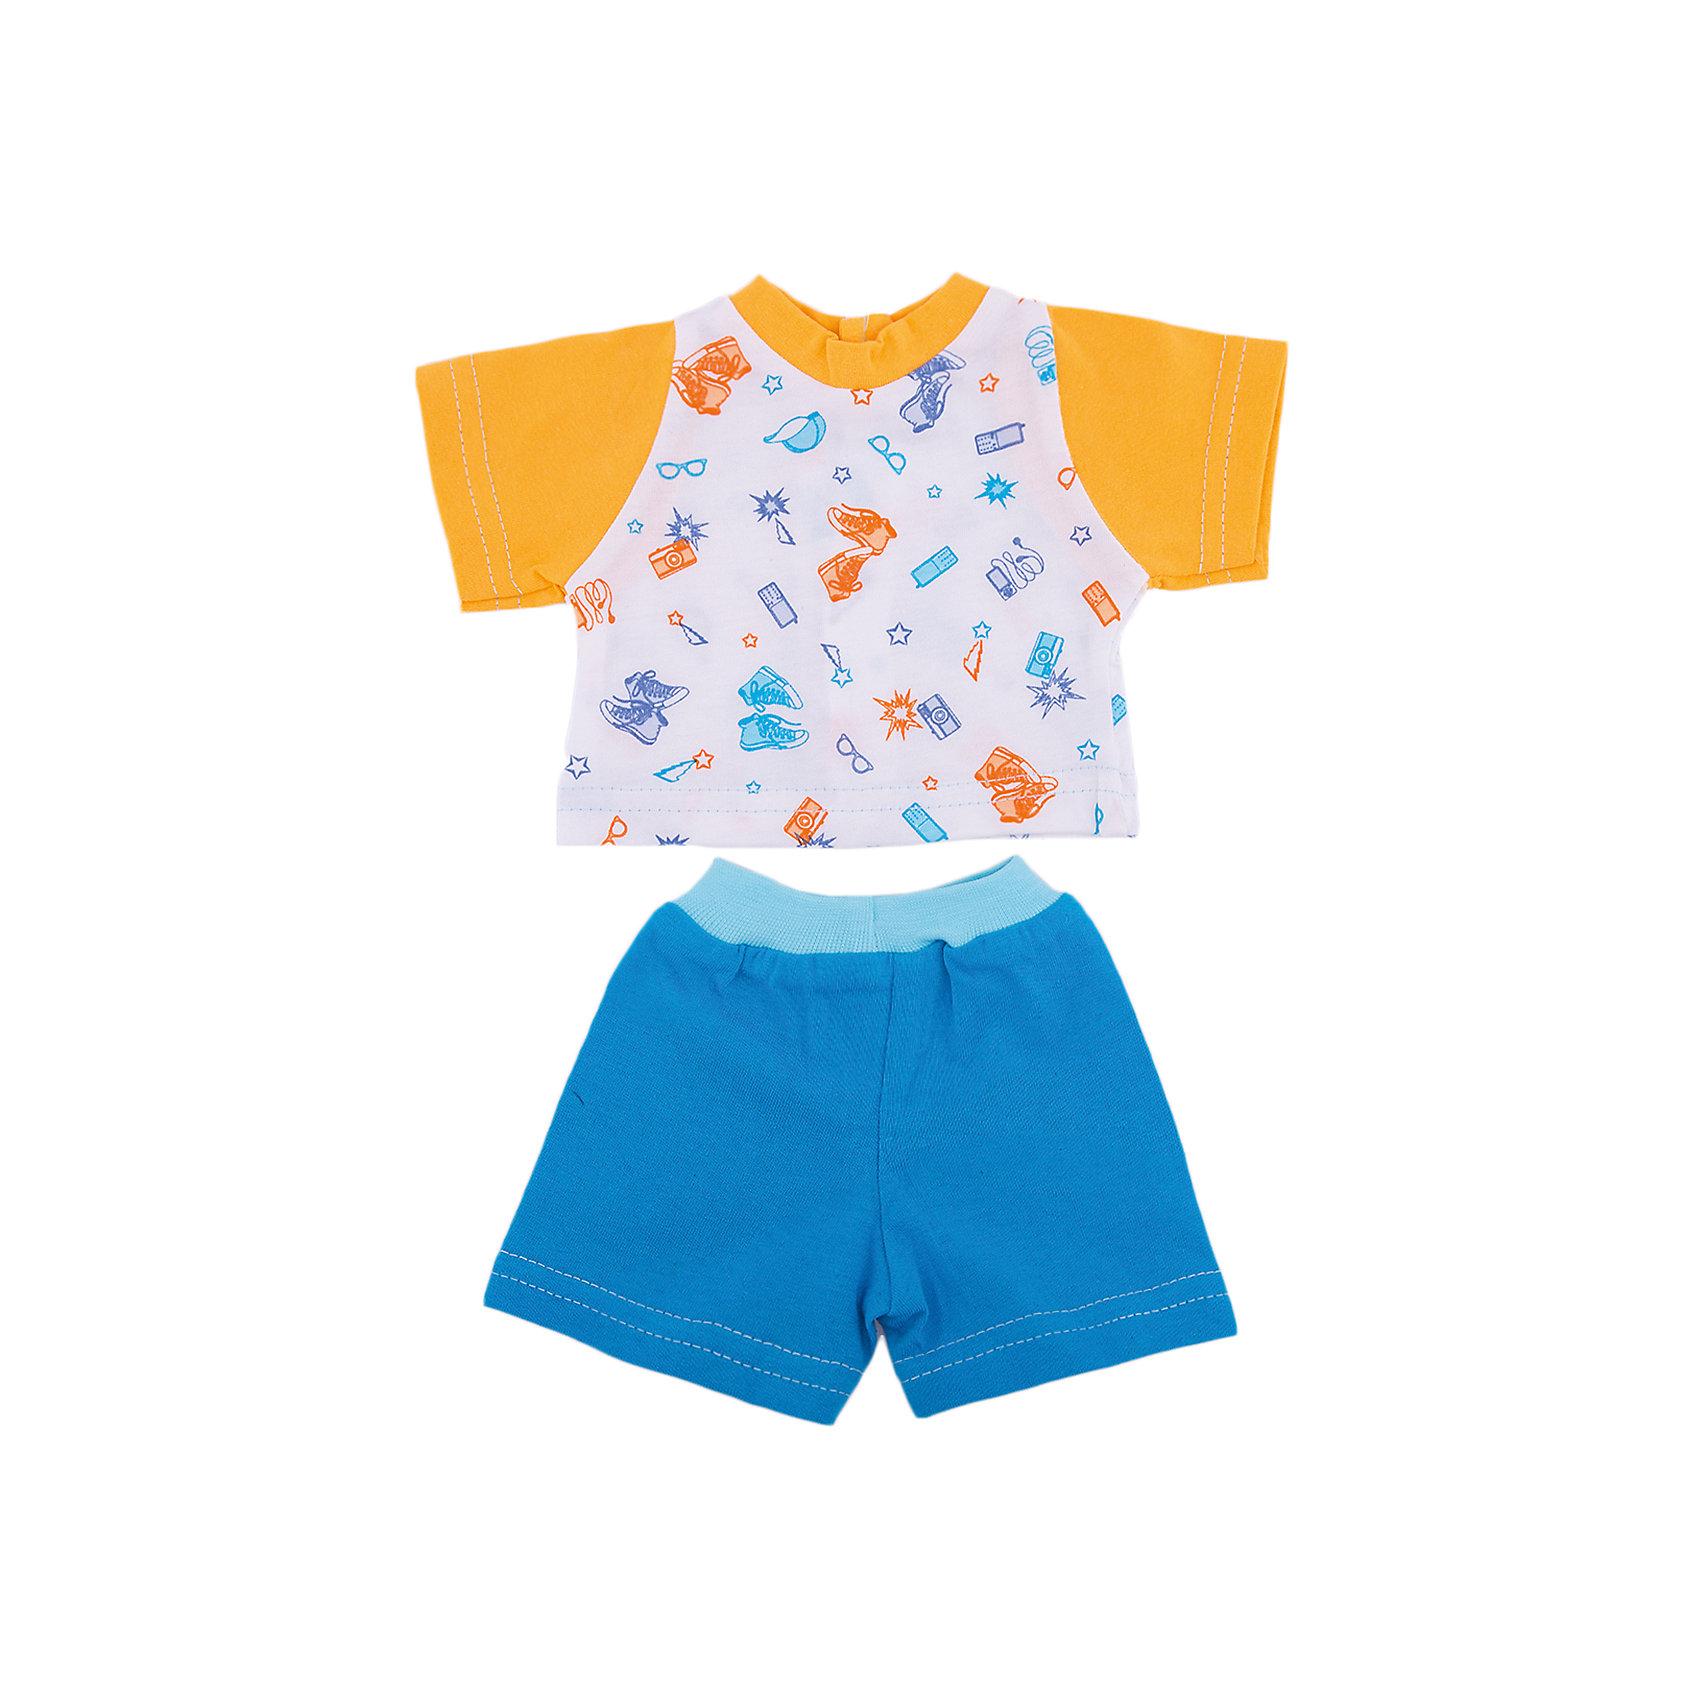 Mary Poppins Одежда для куклы 42 см, футболка и шортики, Mary Poppins, в ассортименте куклы и одежда для кукол bayer малышка первый поцелуй 42 см